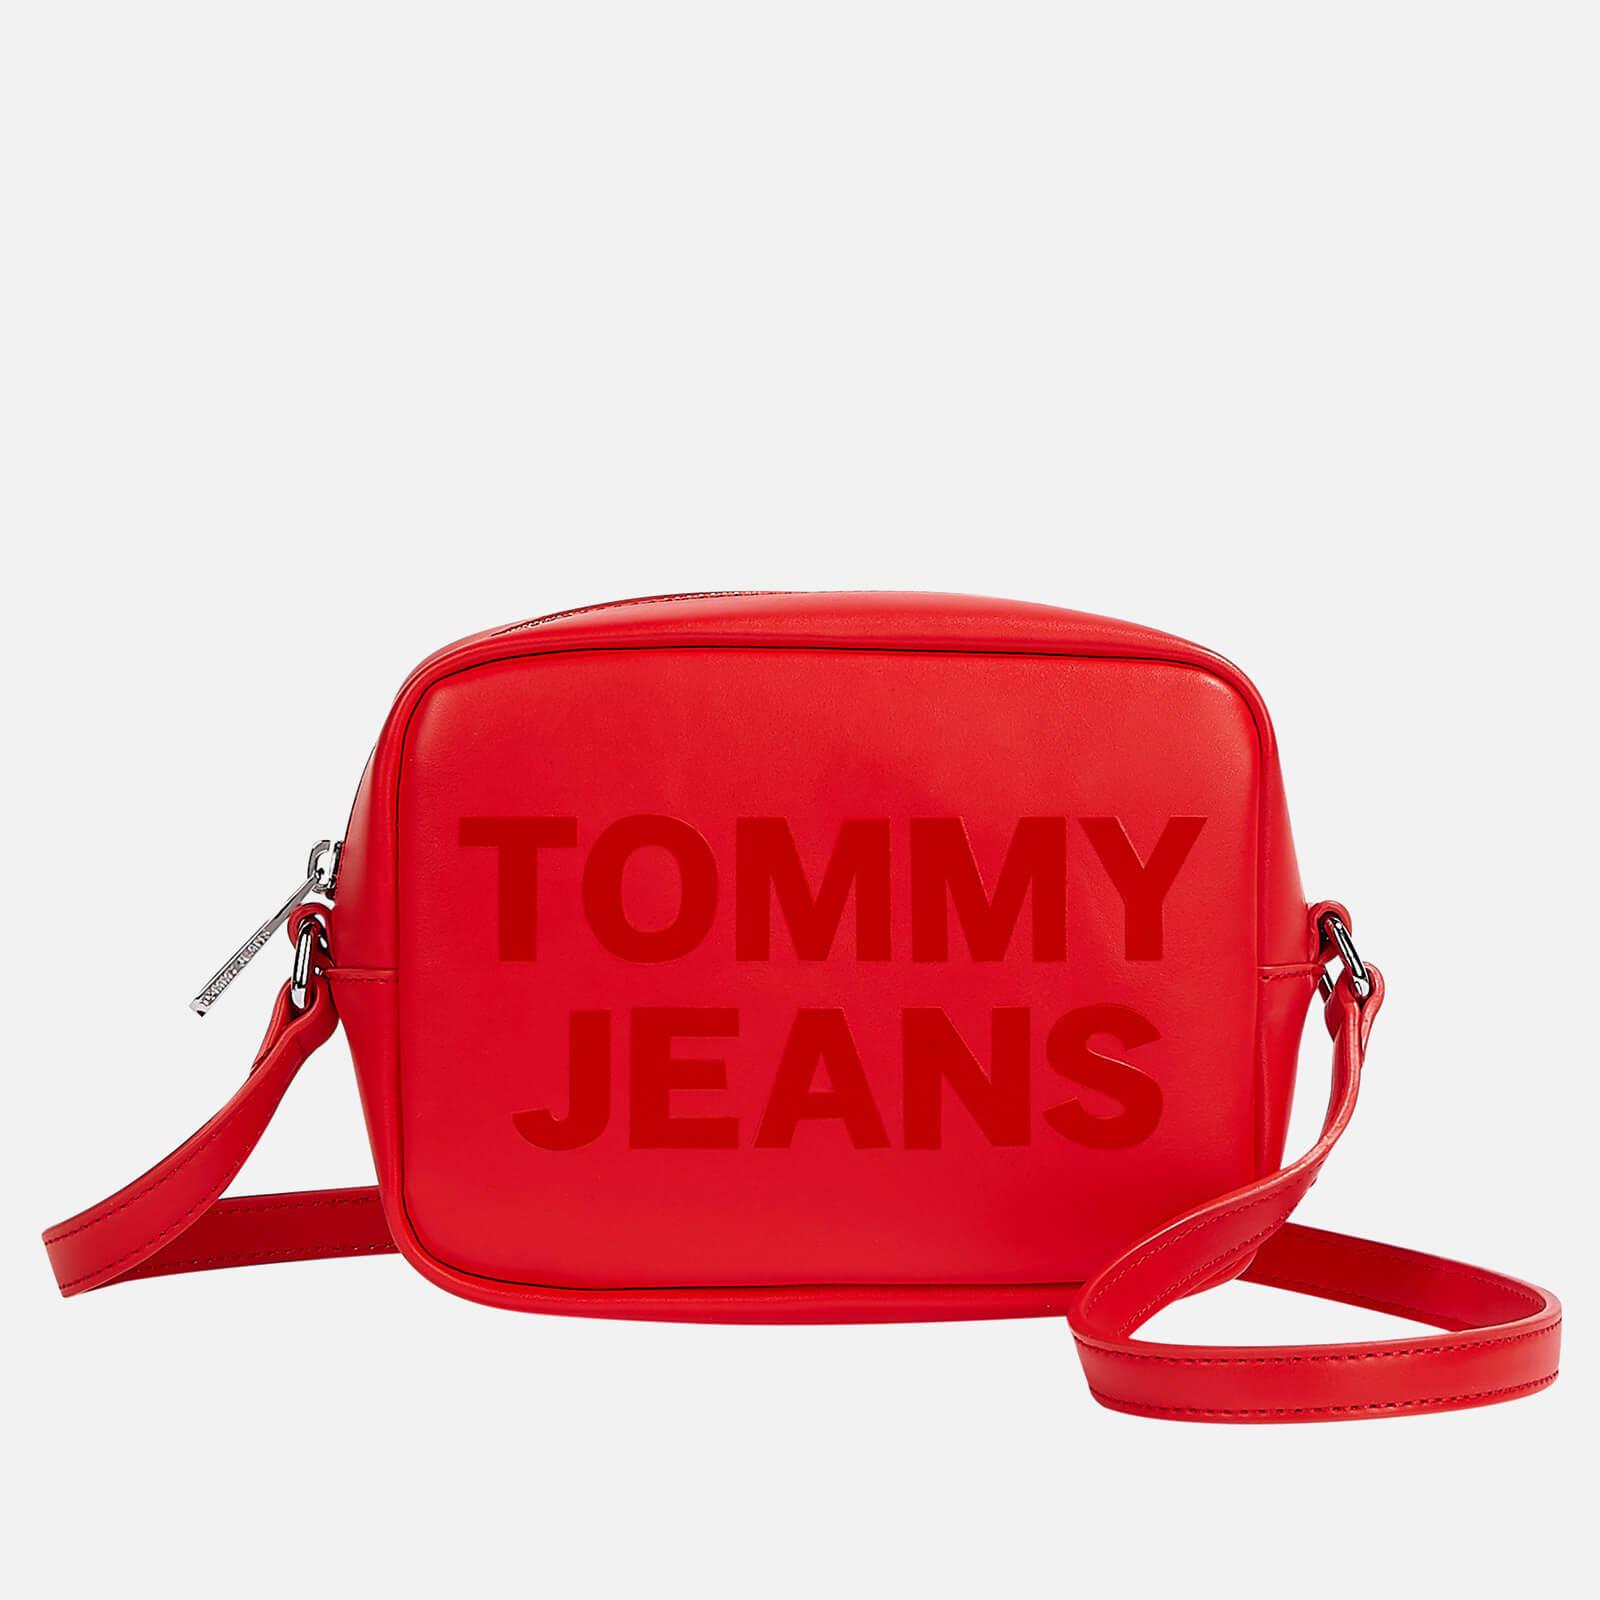 tommy jeans women's camera bag - deep crimson